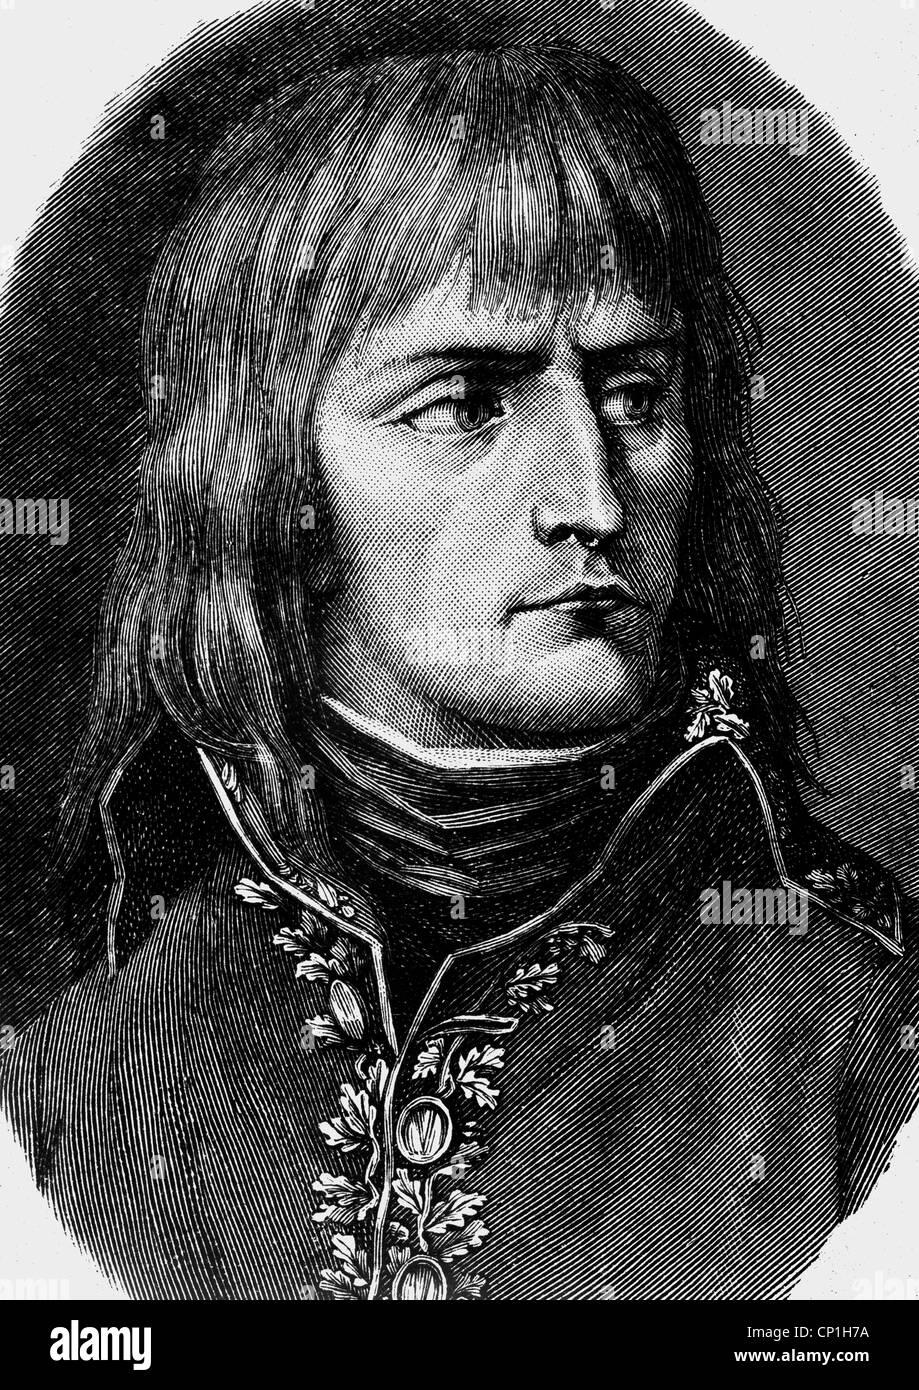 napoleon i emperor of the french essay